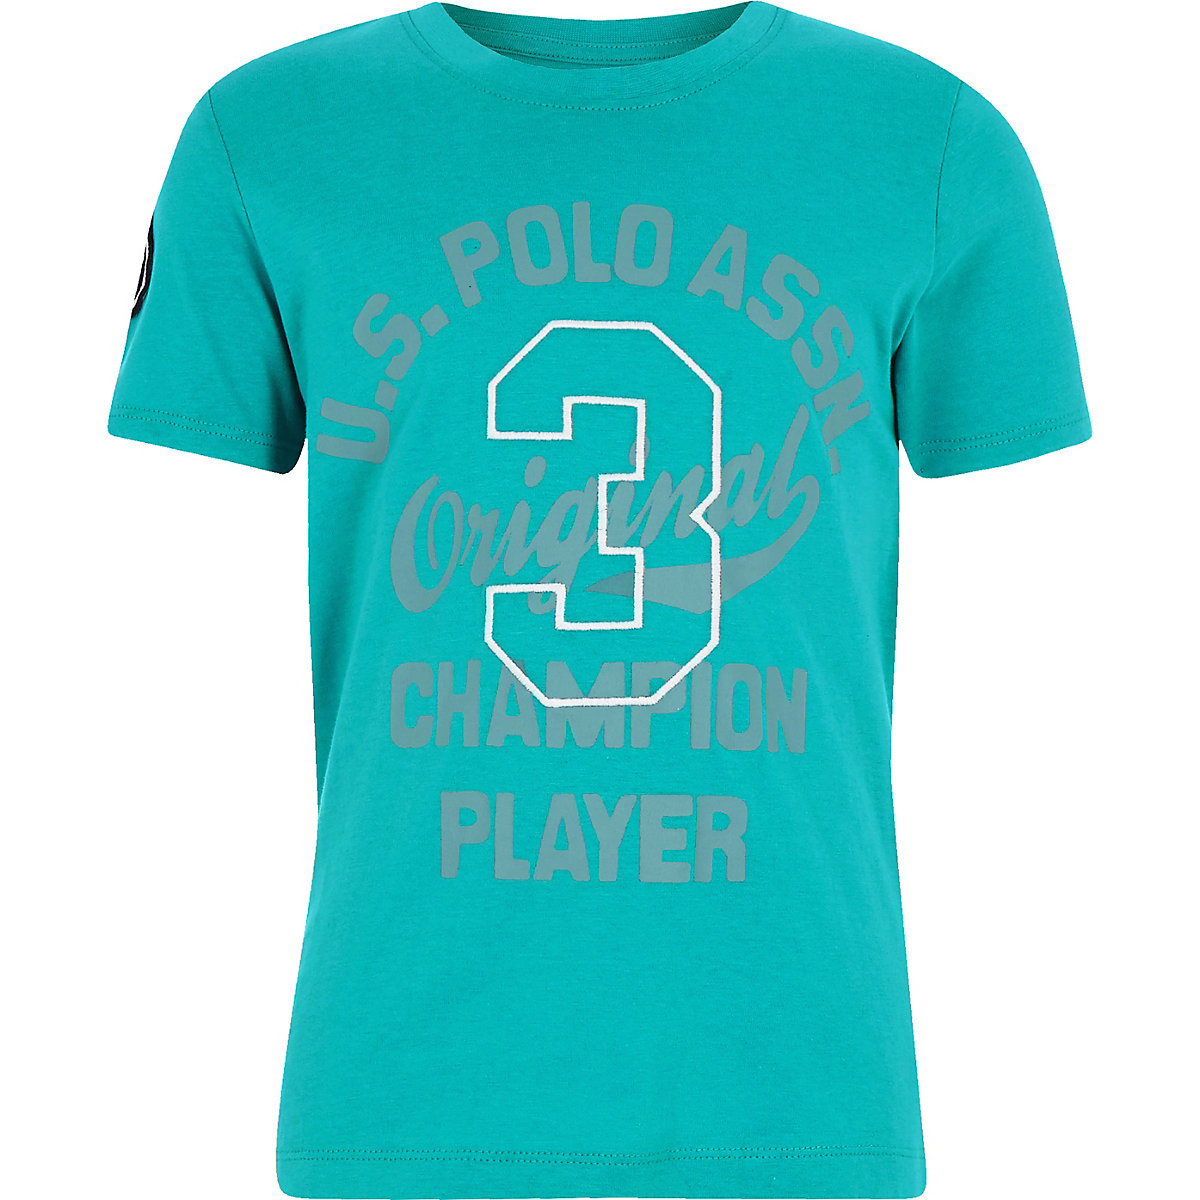 Boys U.S. Polo Assn. blue T-shirt